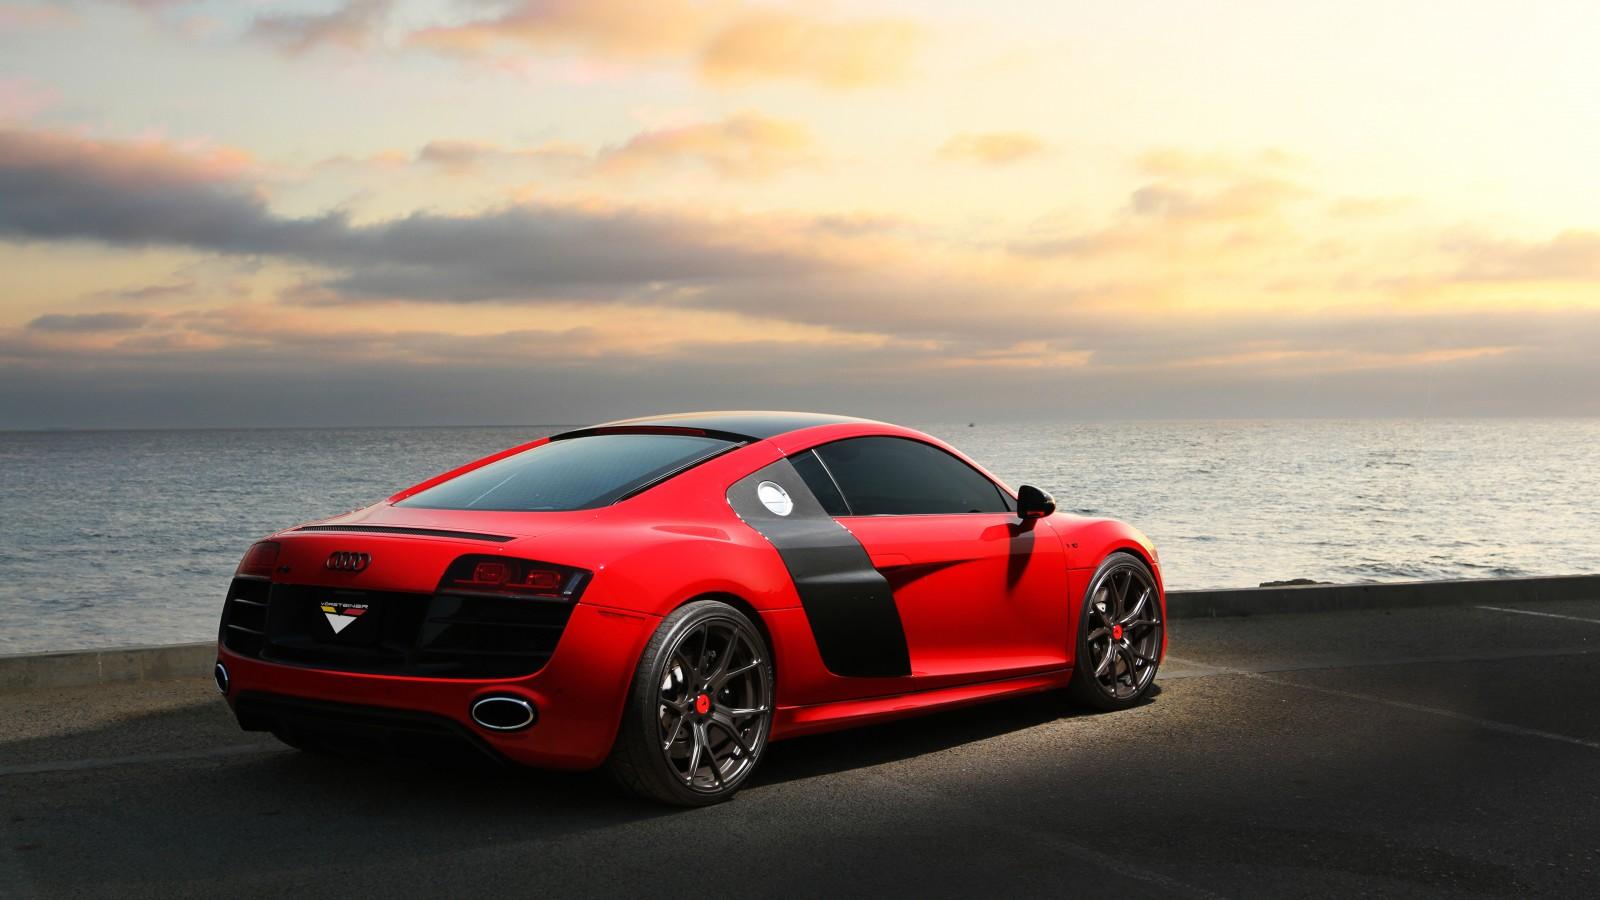 Vorsteiner Audi R8 Carbon Graphite 5K 2 Wallpaper  HD Car Wallpapers  ID 6925